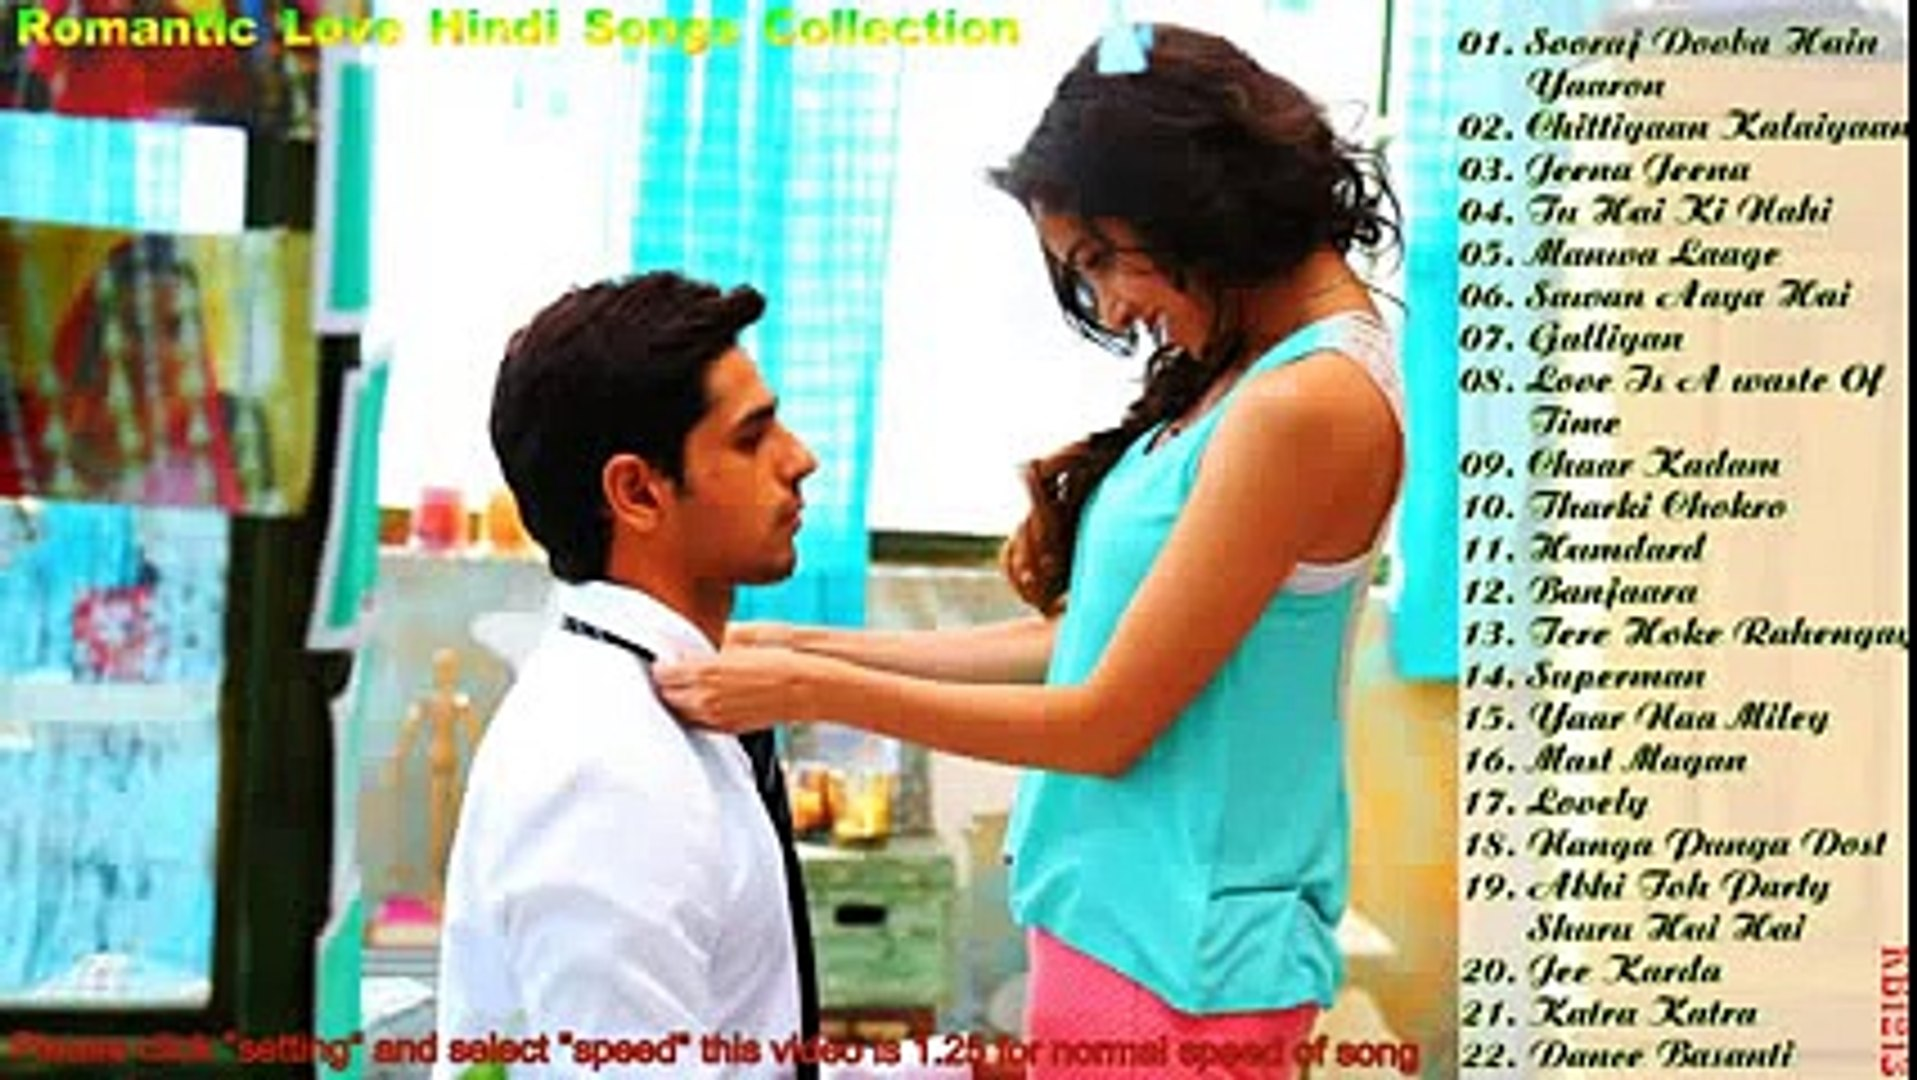 Hindi song romantic Best Romantic